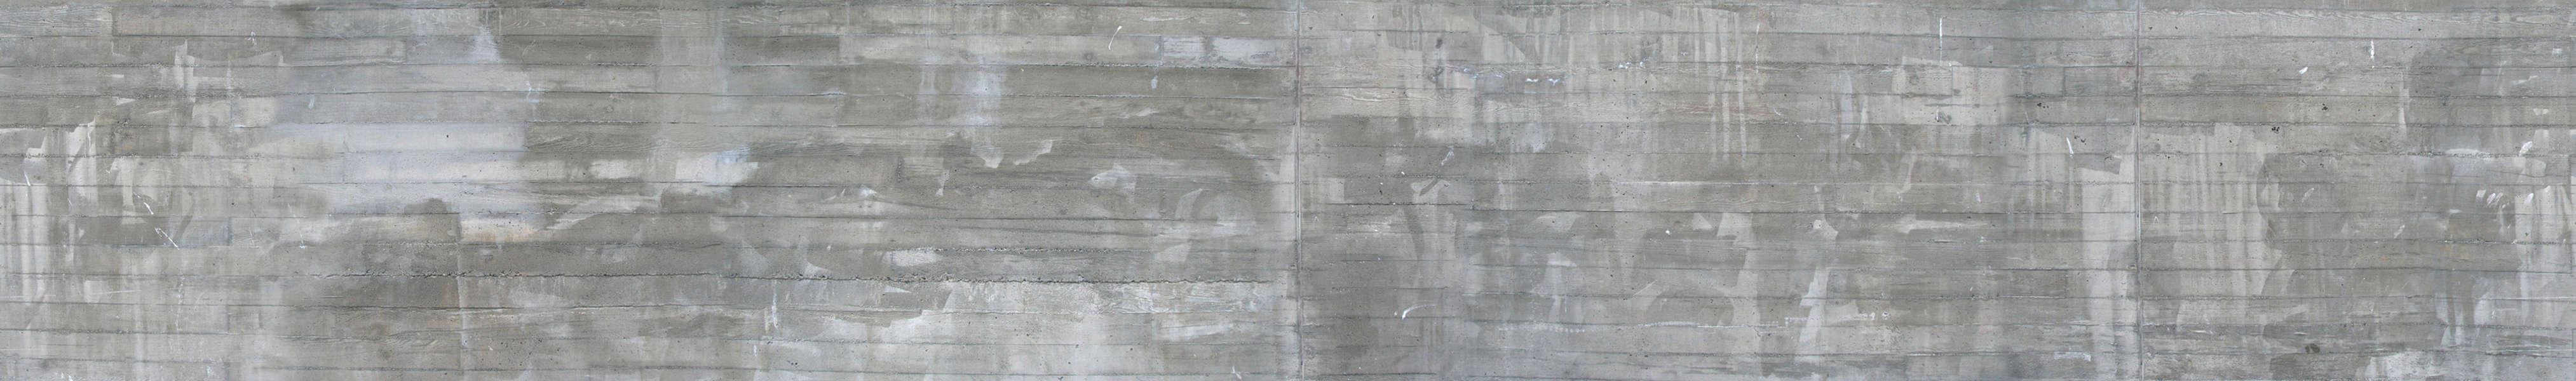 Concretebunker0059 Free Background Texture Concrete